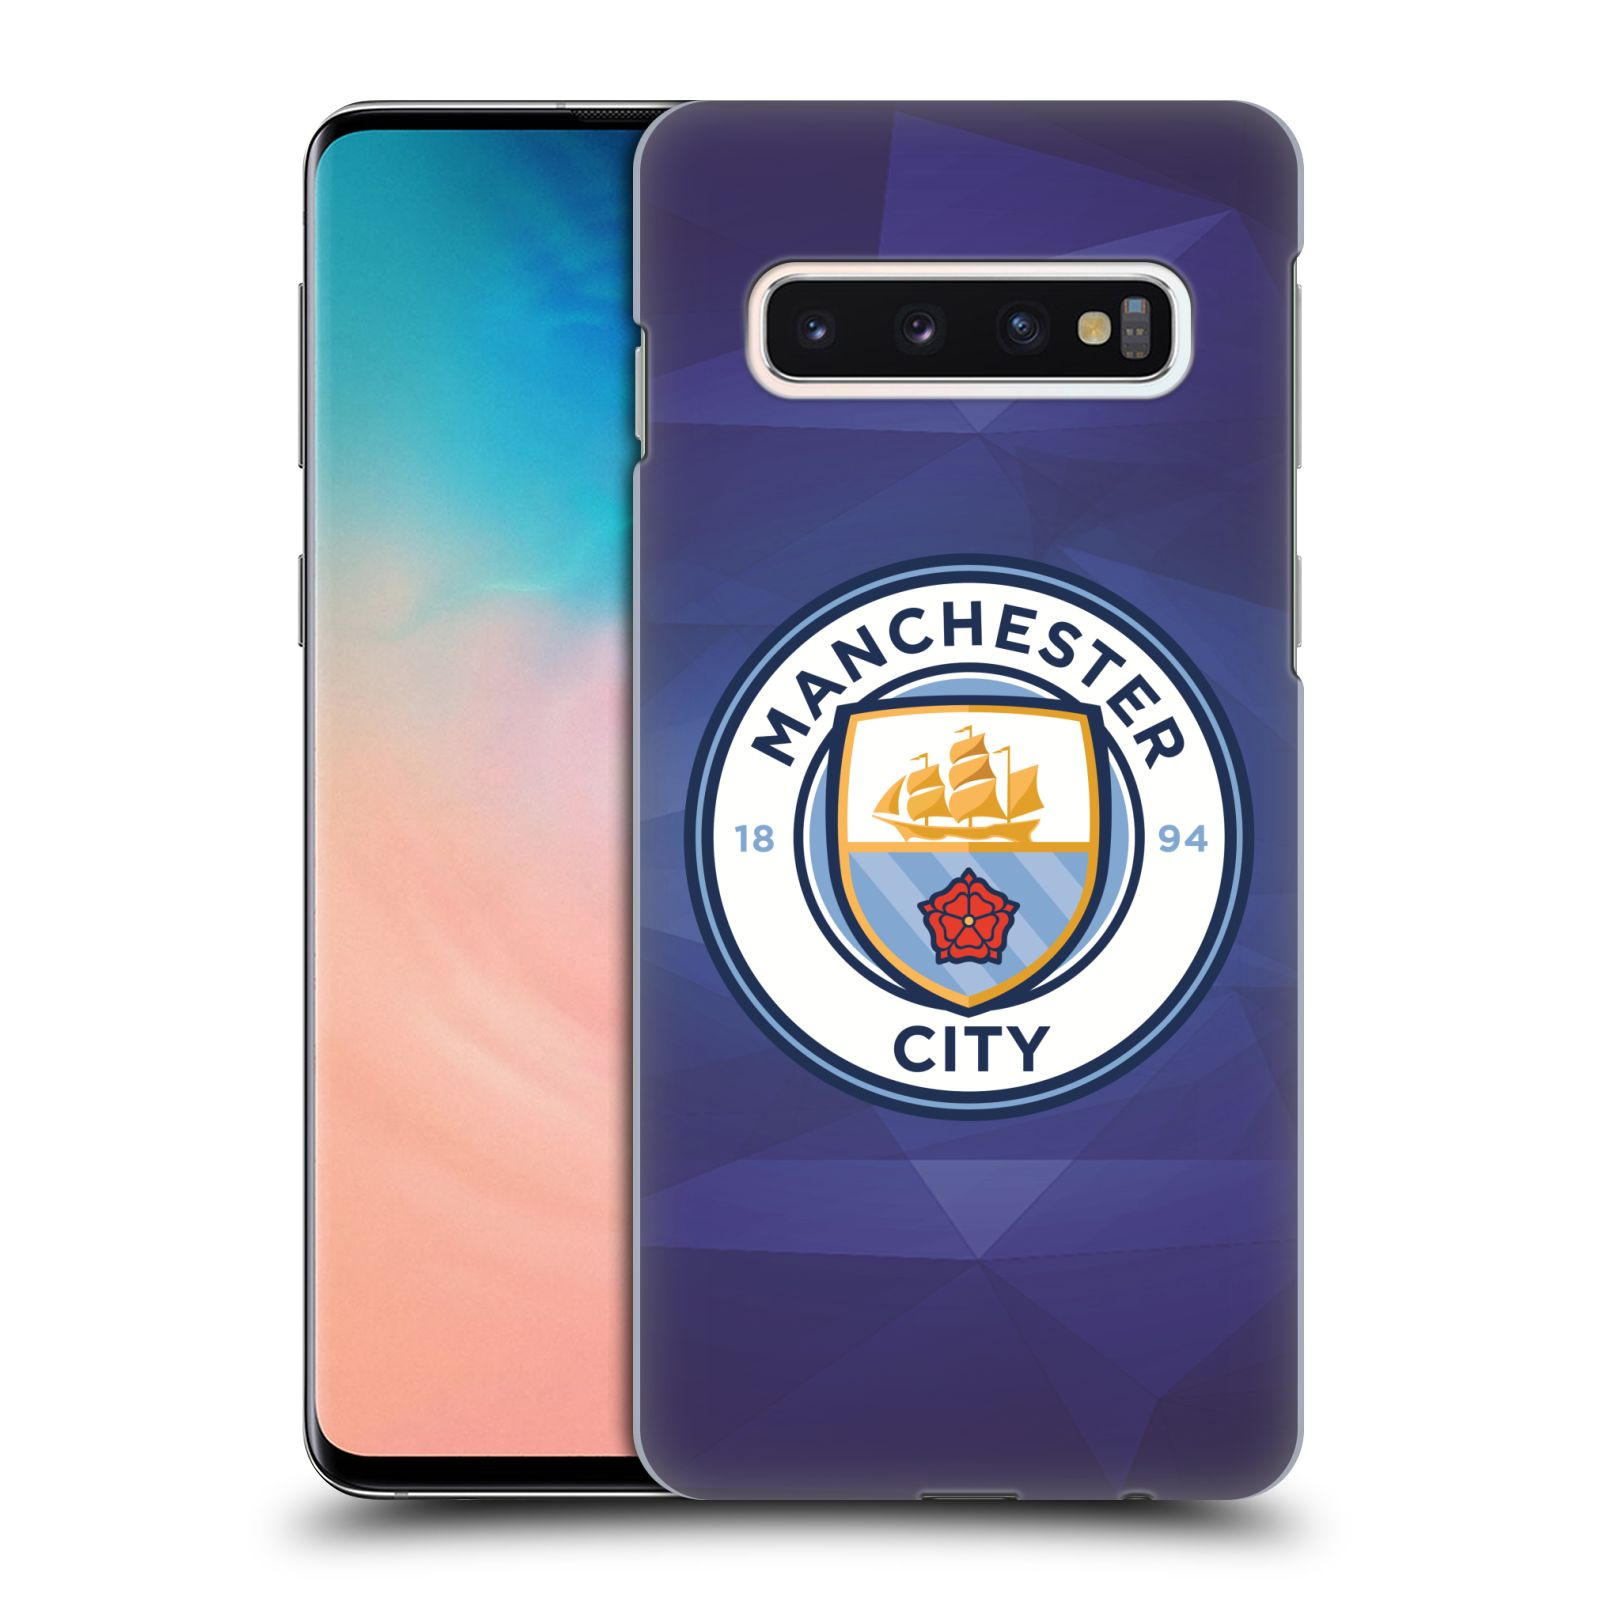 Plastové pouzdro na mobil Samsung Galaxy S10 - Head Case - Manchester City FC - Modré nové logo